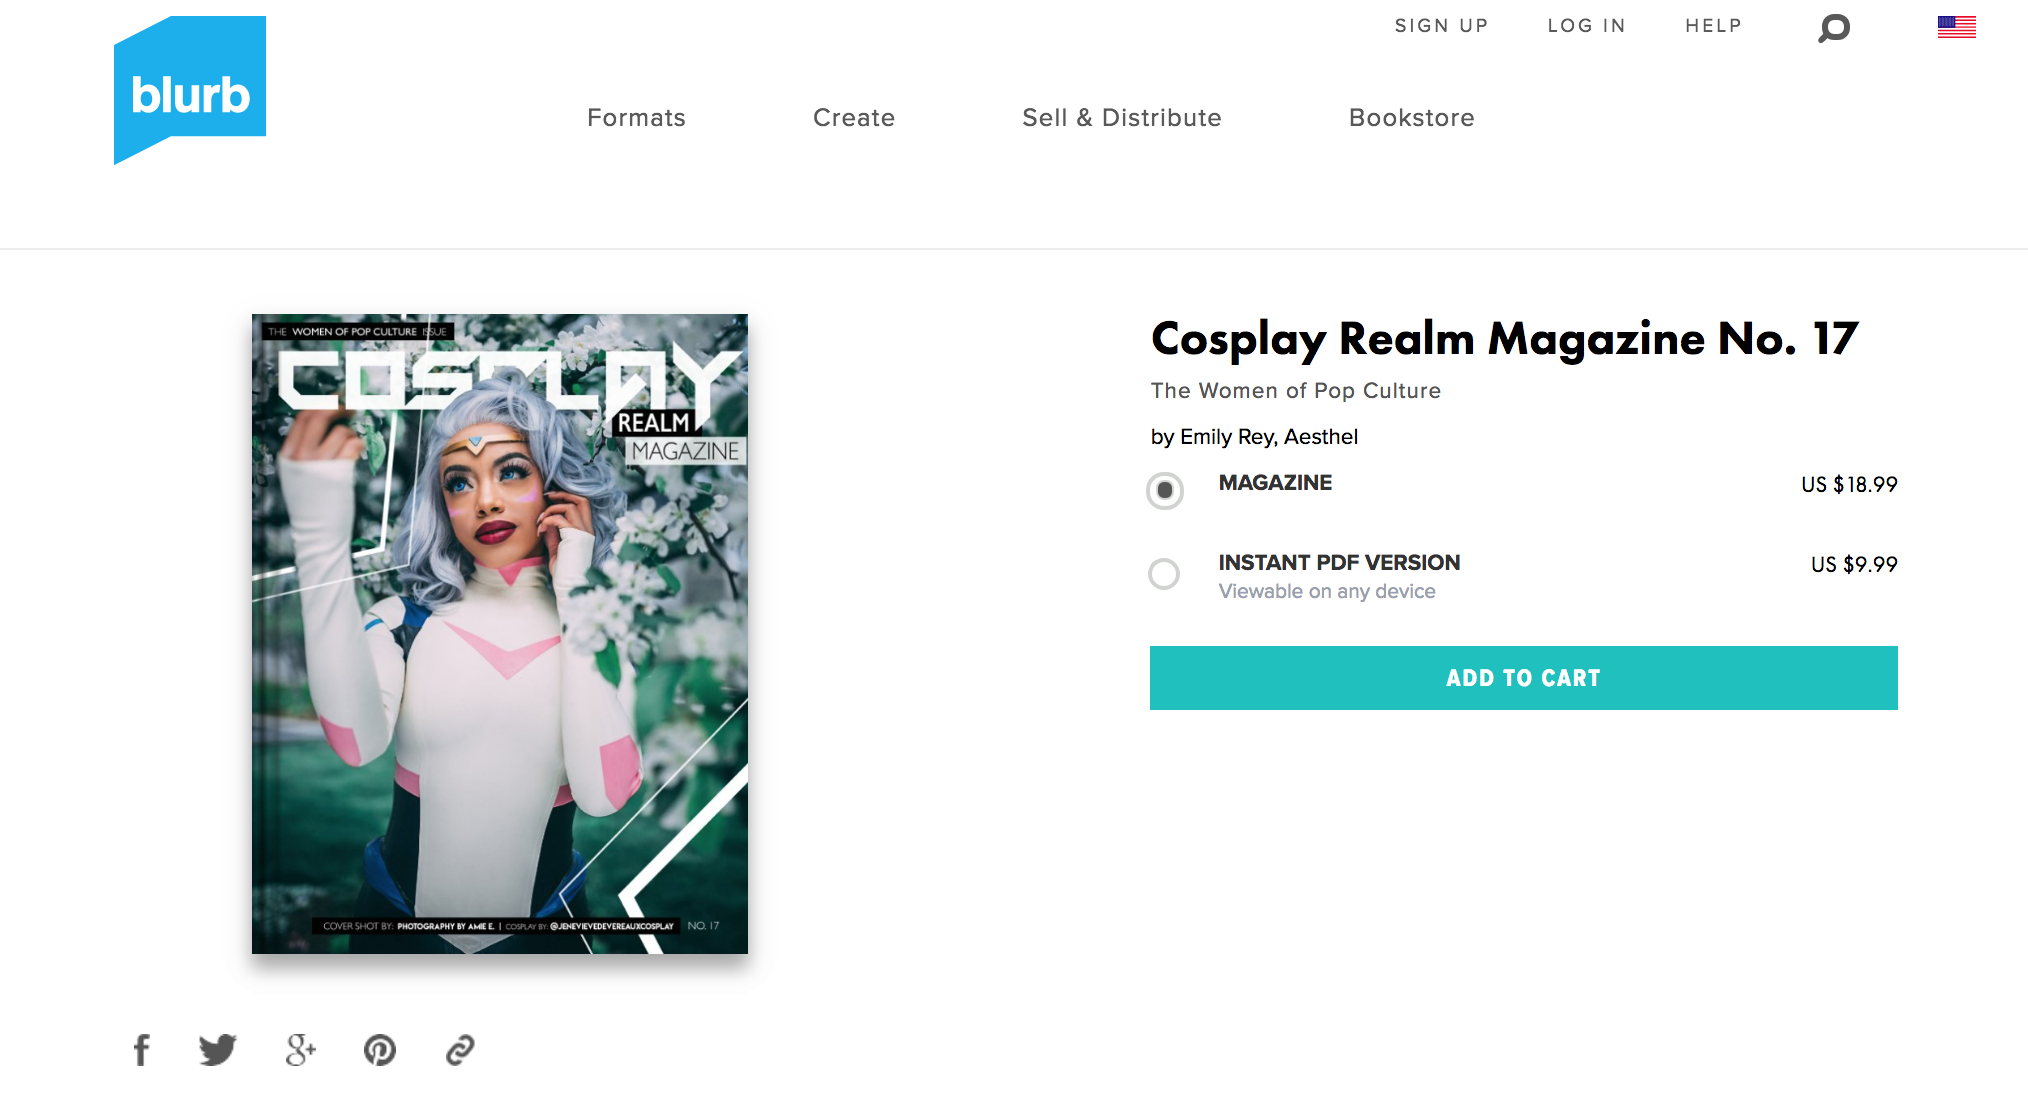 BUY A COPY HERE : http://www.blurb.com/b/8897792-cosplay-realm-magazine-no-17